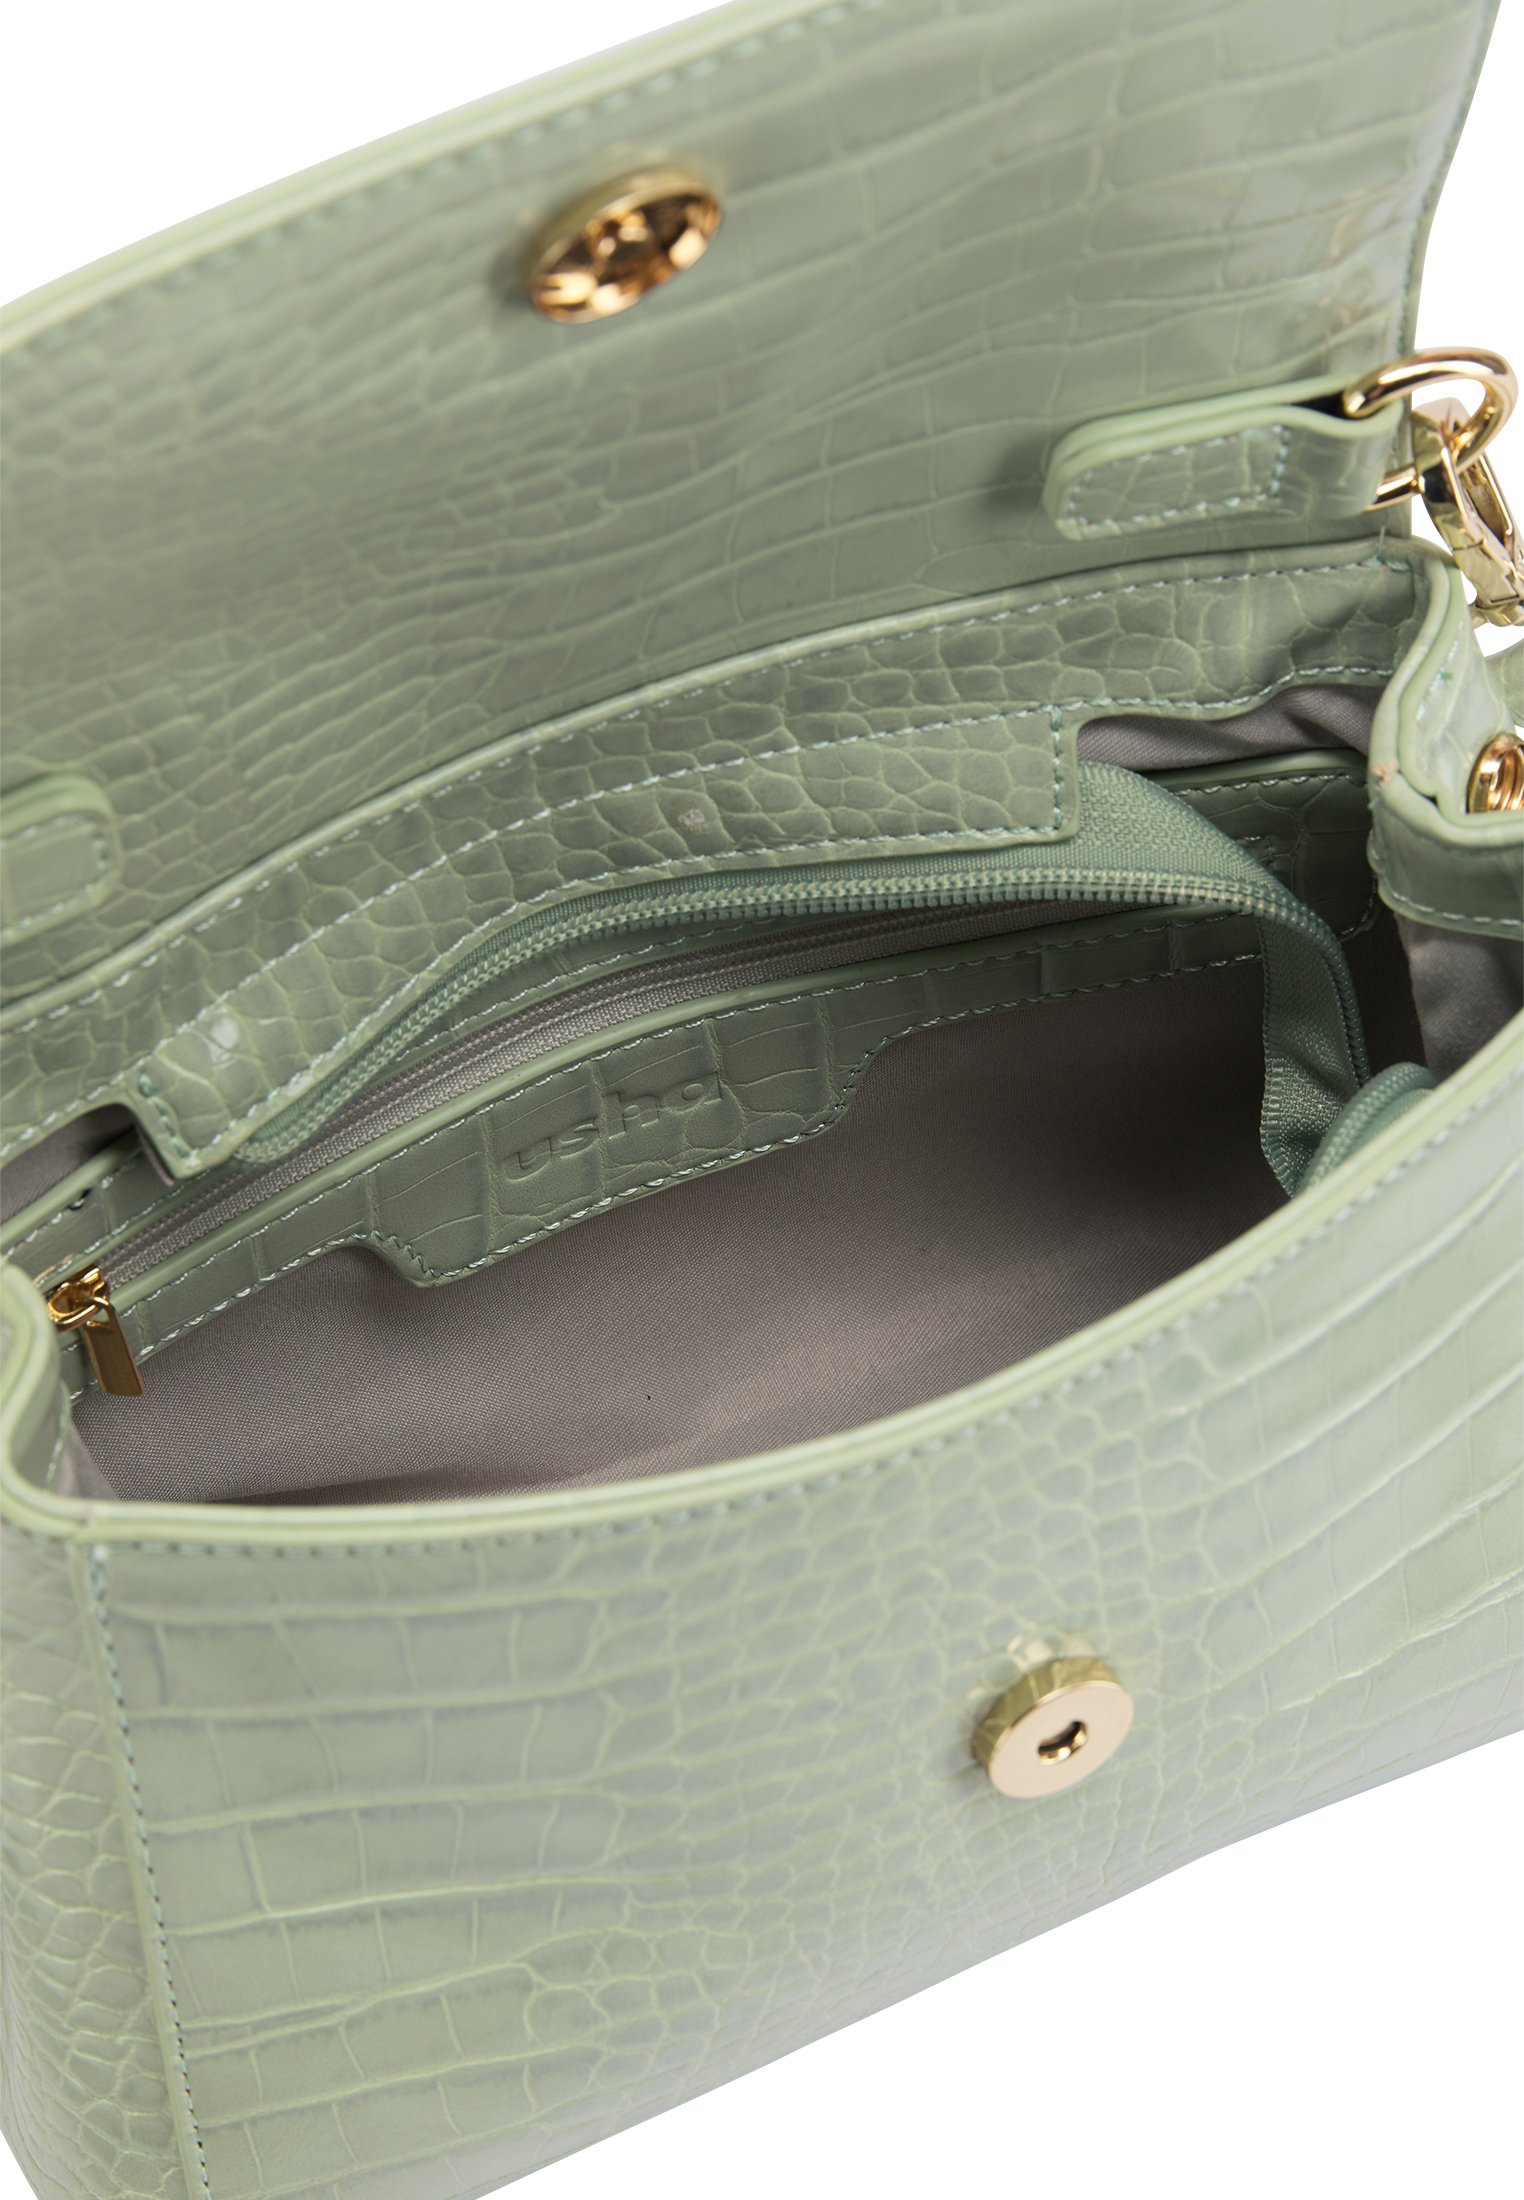 Explore Visit New Accessories usha UMHÄNGETASCHE Across body bag minze hnptEUS5r HhqRyDh4H